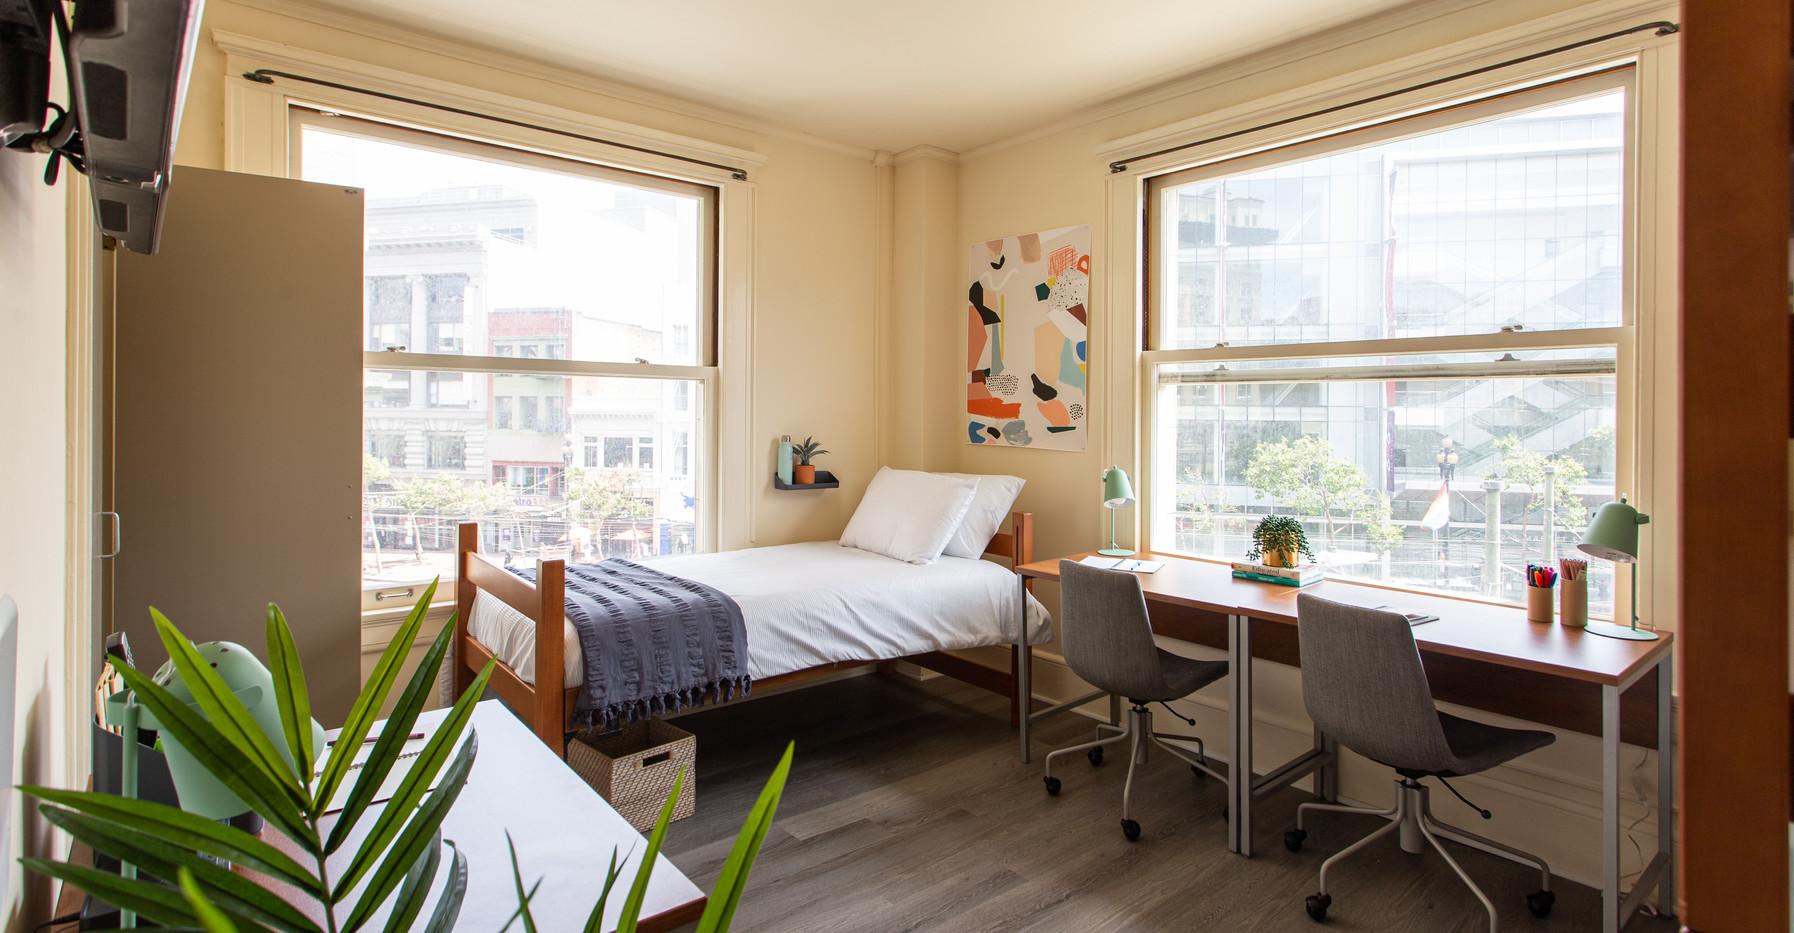 San Francisco student room 4